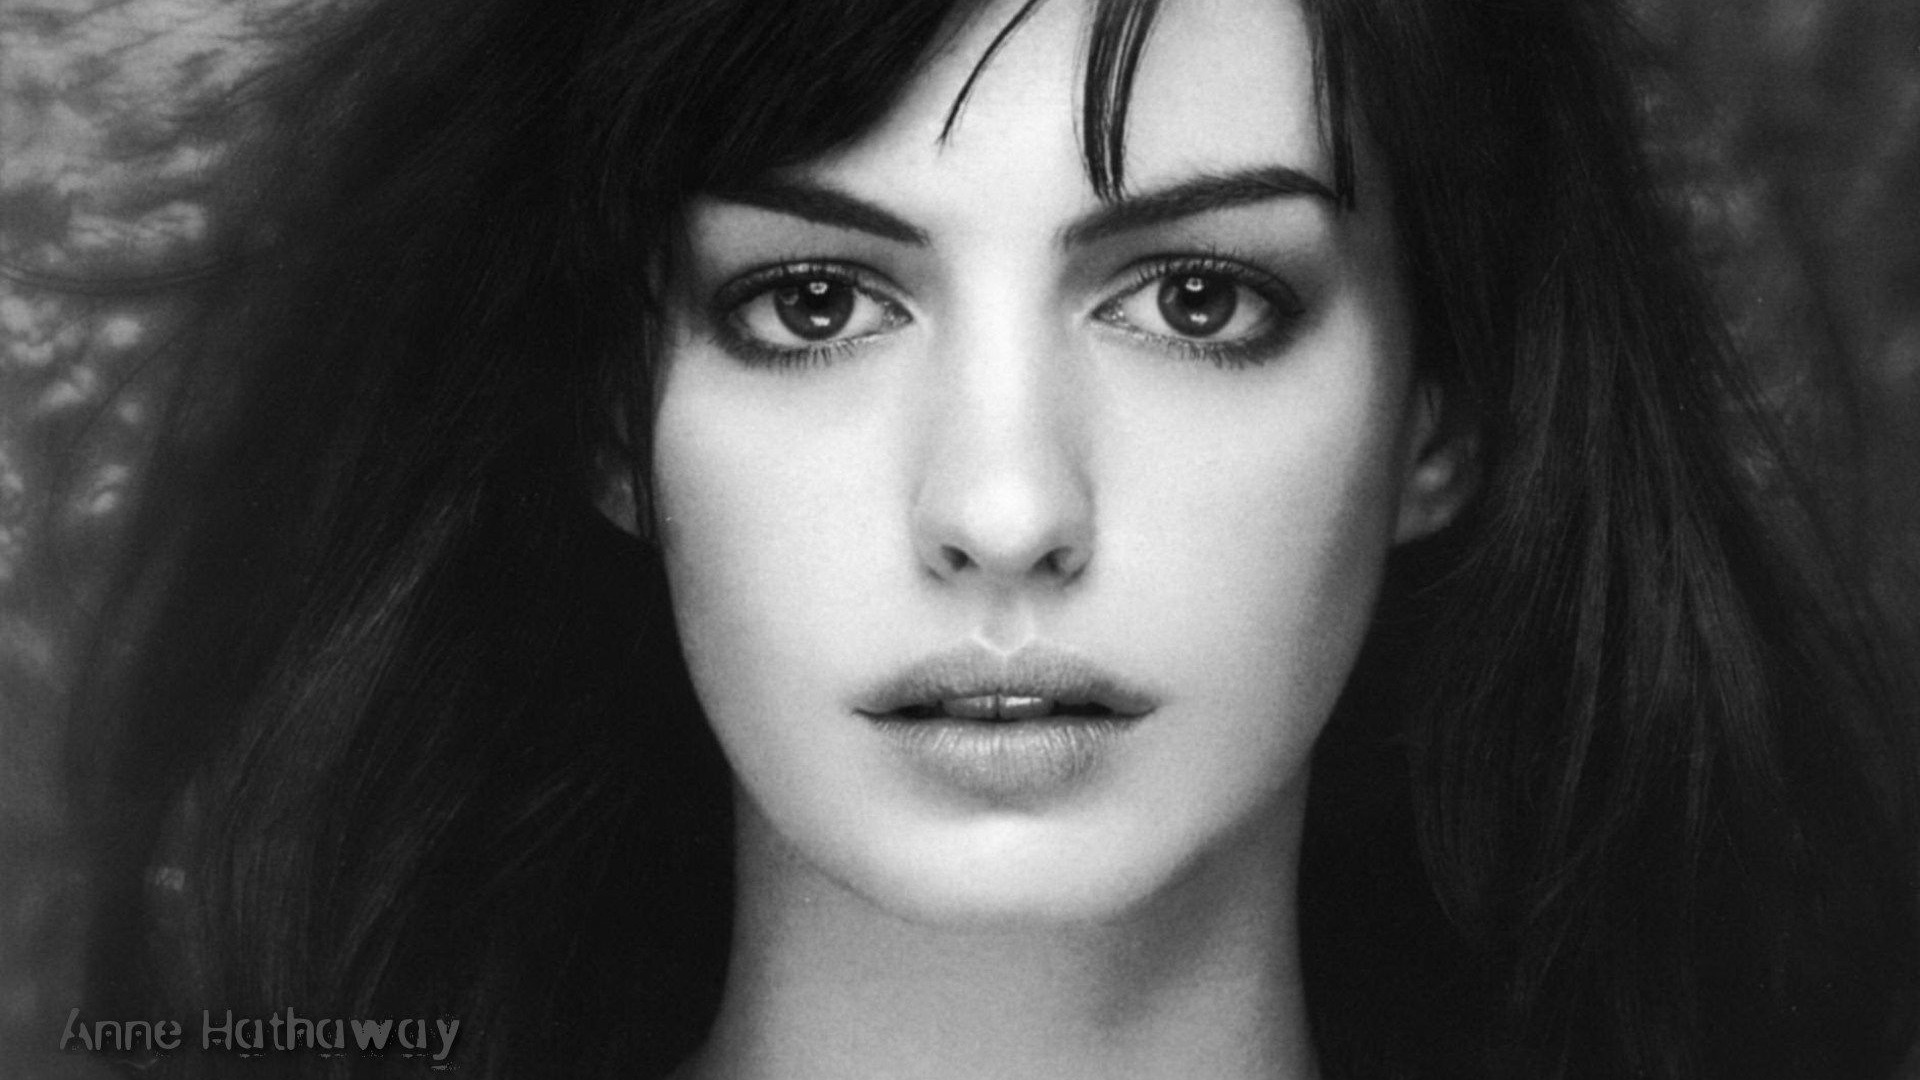 Anne Hathaway Wallpaper 1920x1080